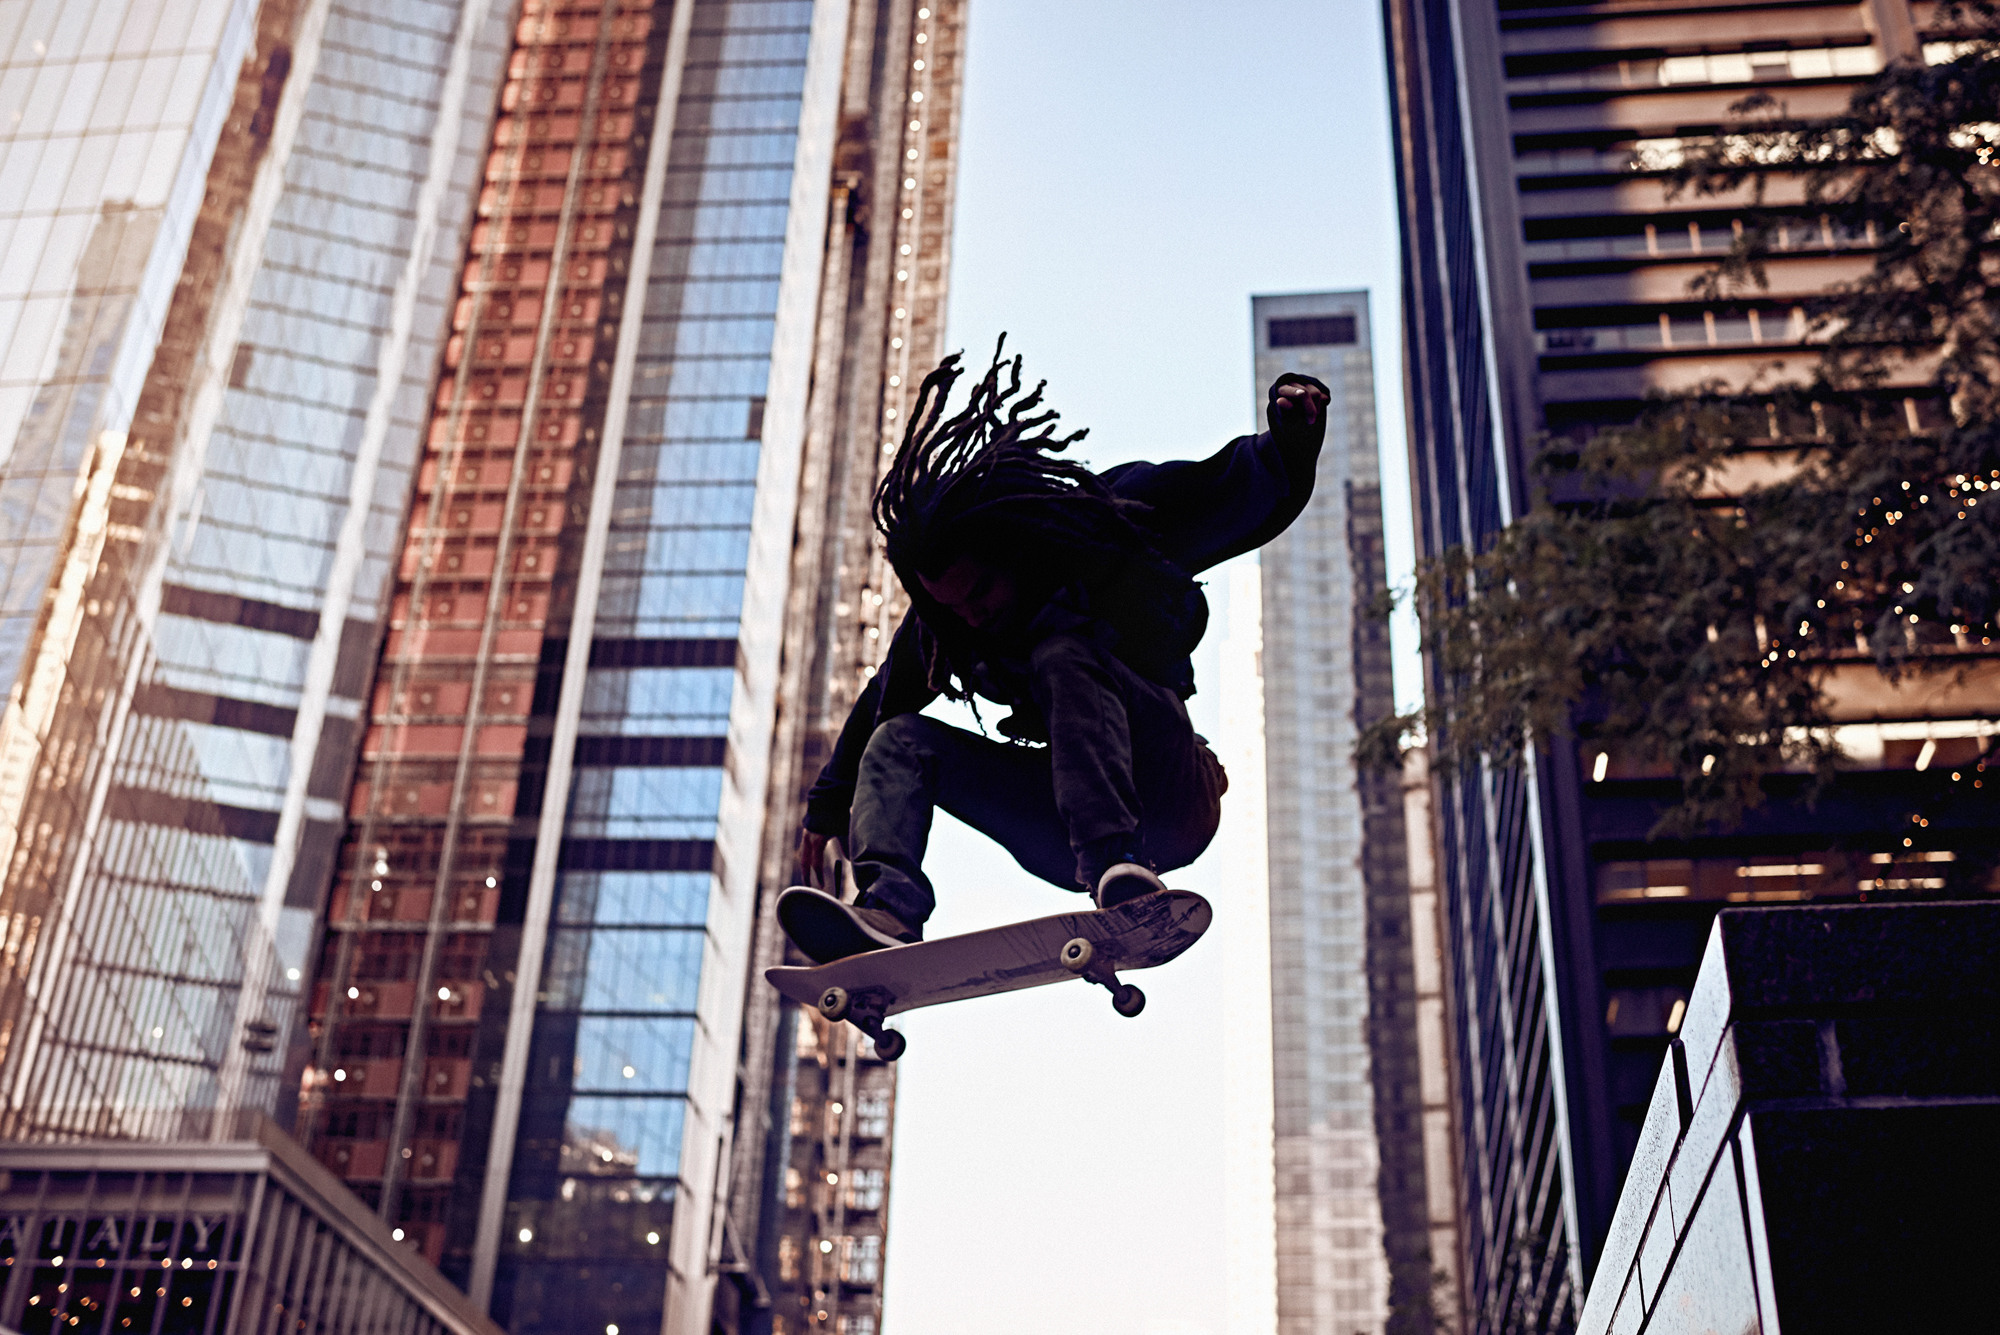 jumping skateboarder new york city